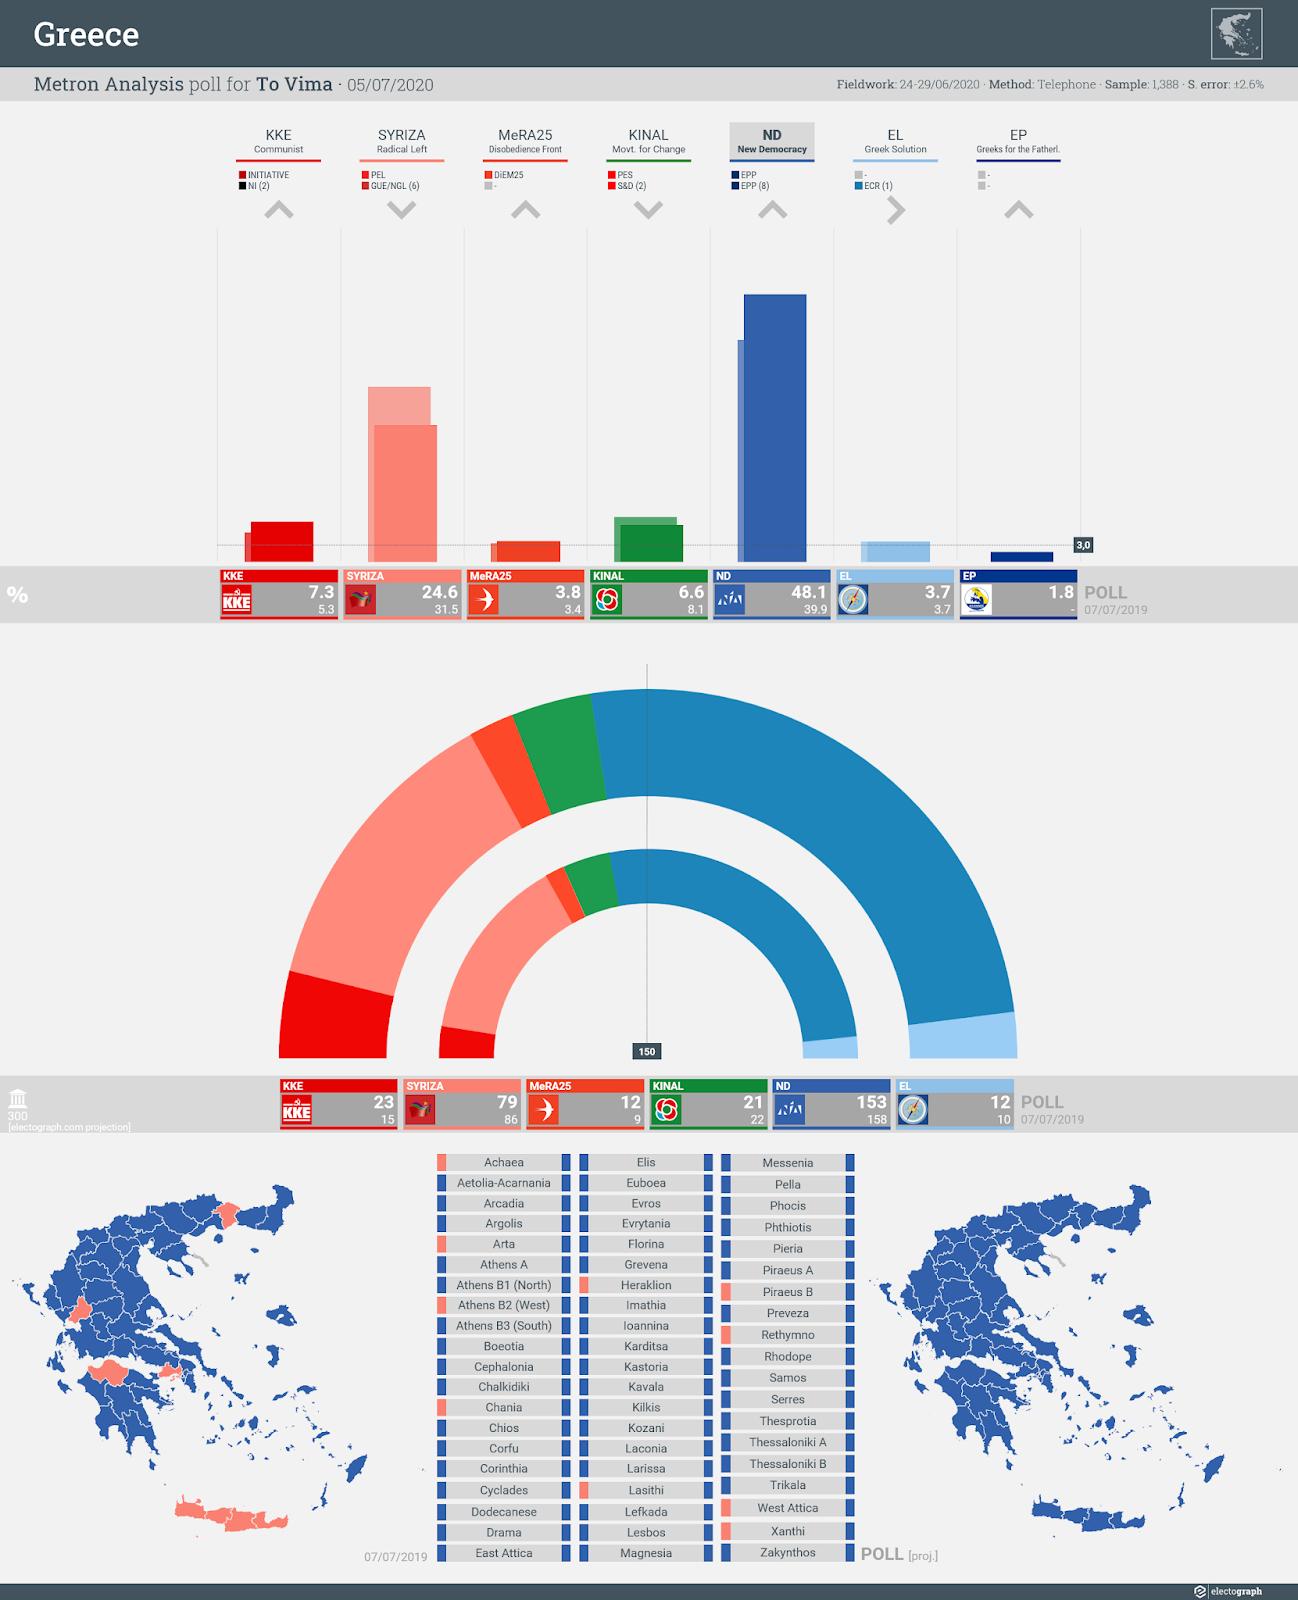 GREECE: Metron Analysis poll chart for To Vima, 5 July 2020